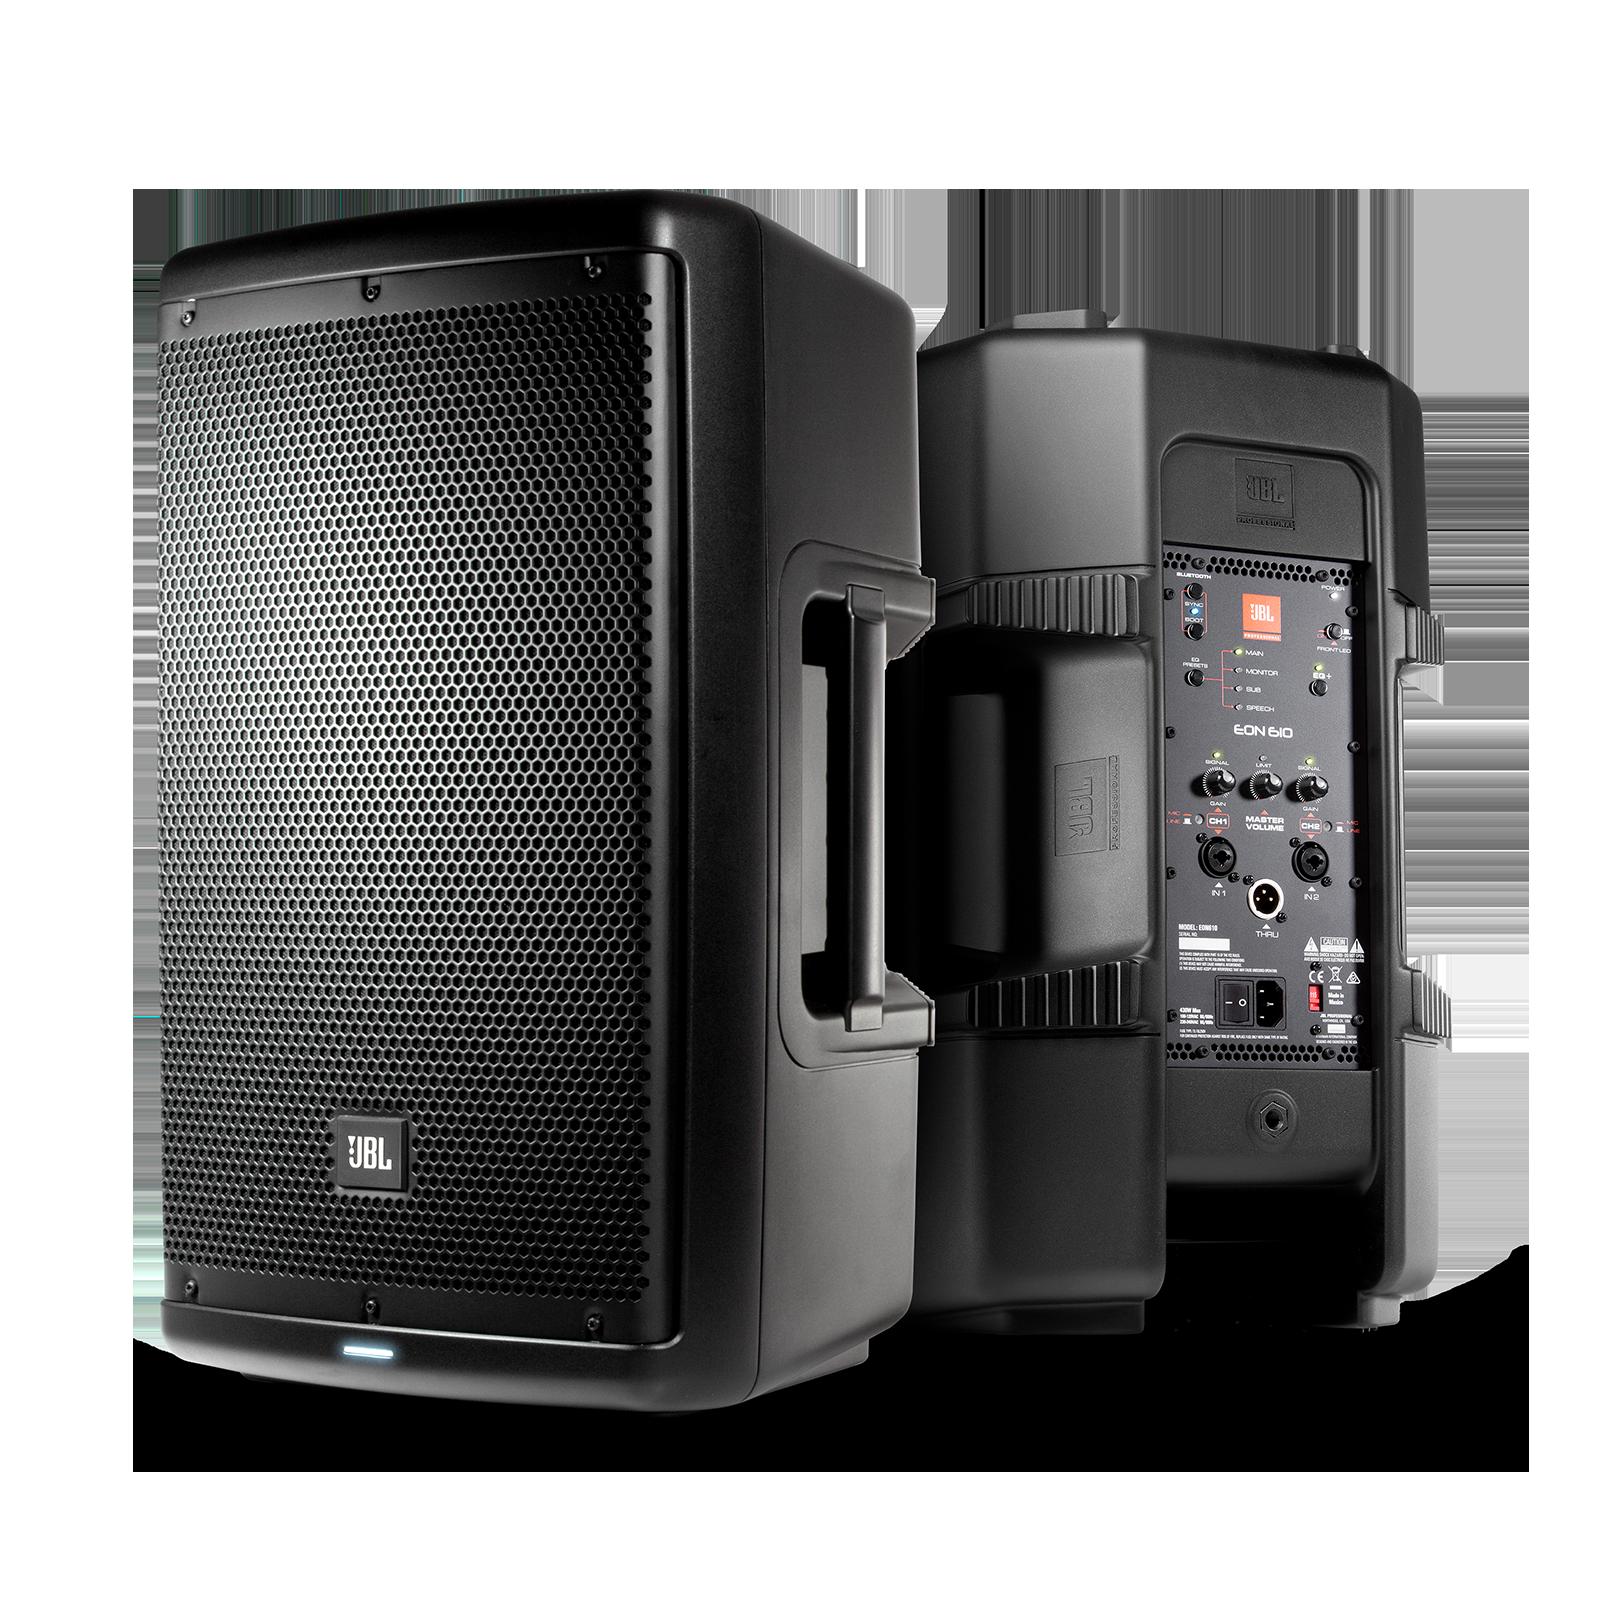 "JBL EON610 - Black - 10"" (25 cm) Two-Way Multipurpose Self-Powered Sound Reinforcement - Hero"